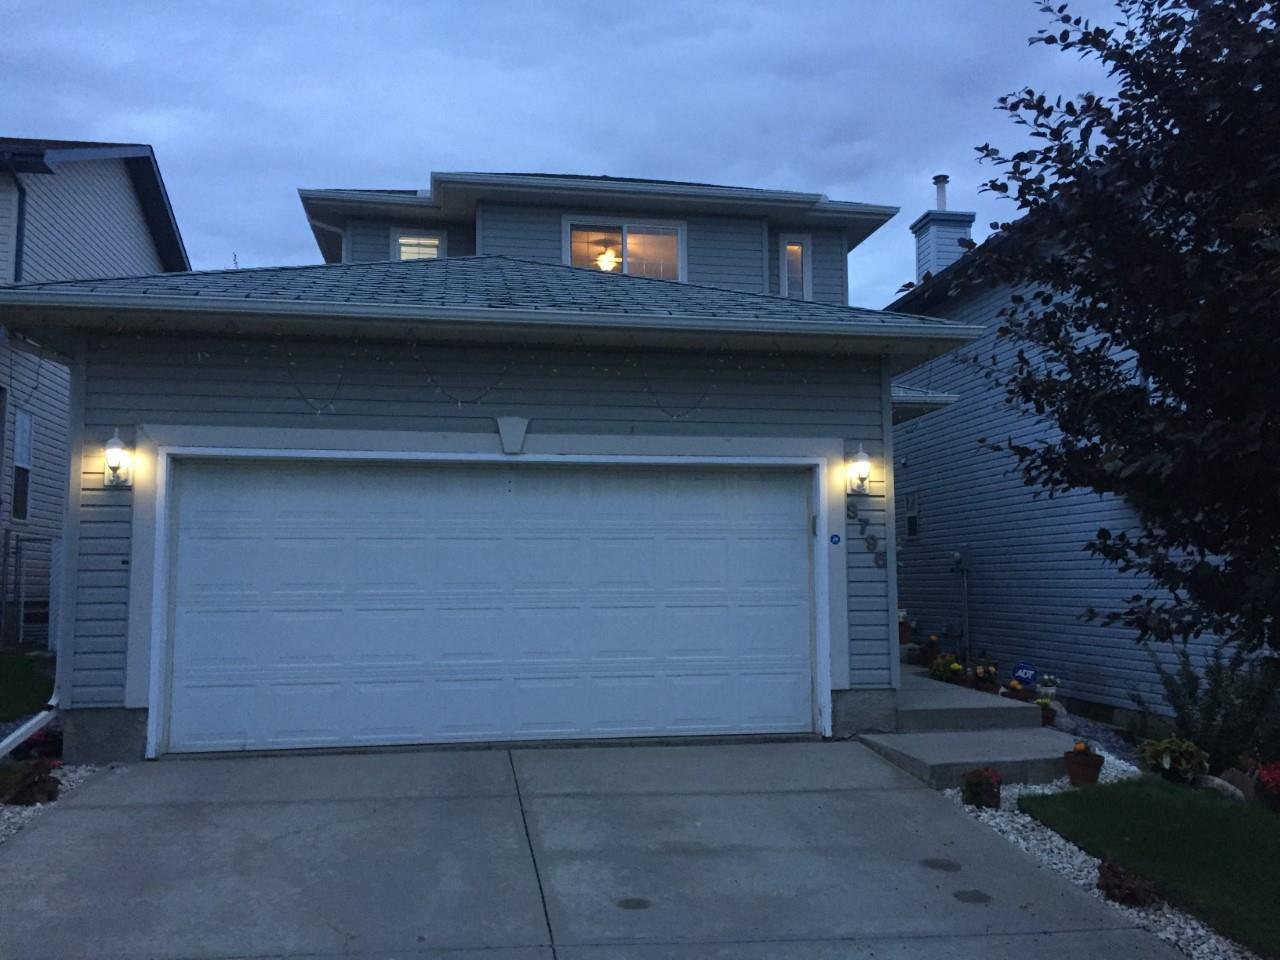 Main Photo: 3796 21 Street in Edmonton: Zone 30 House for sale : MLS®# E4166379